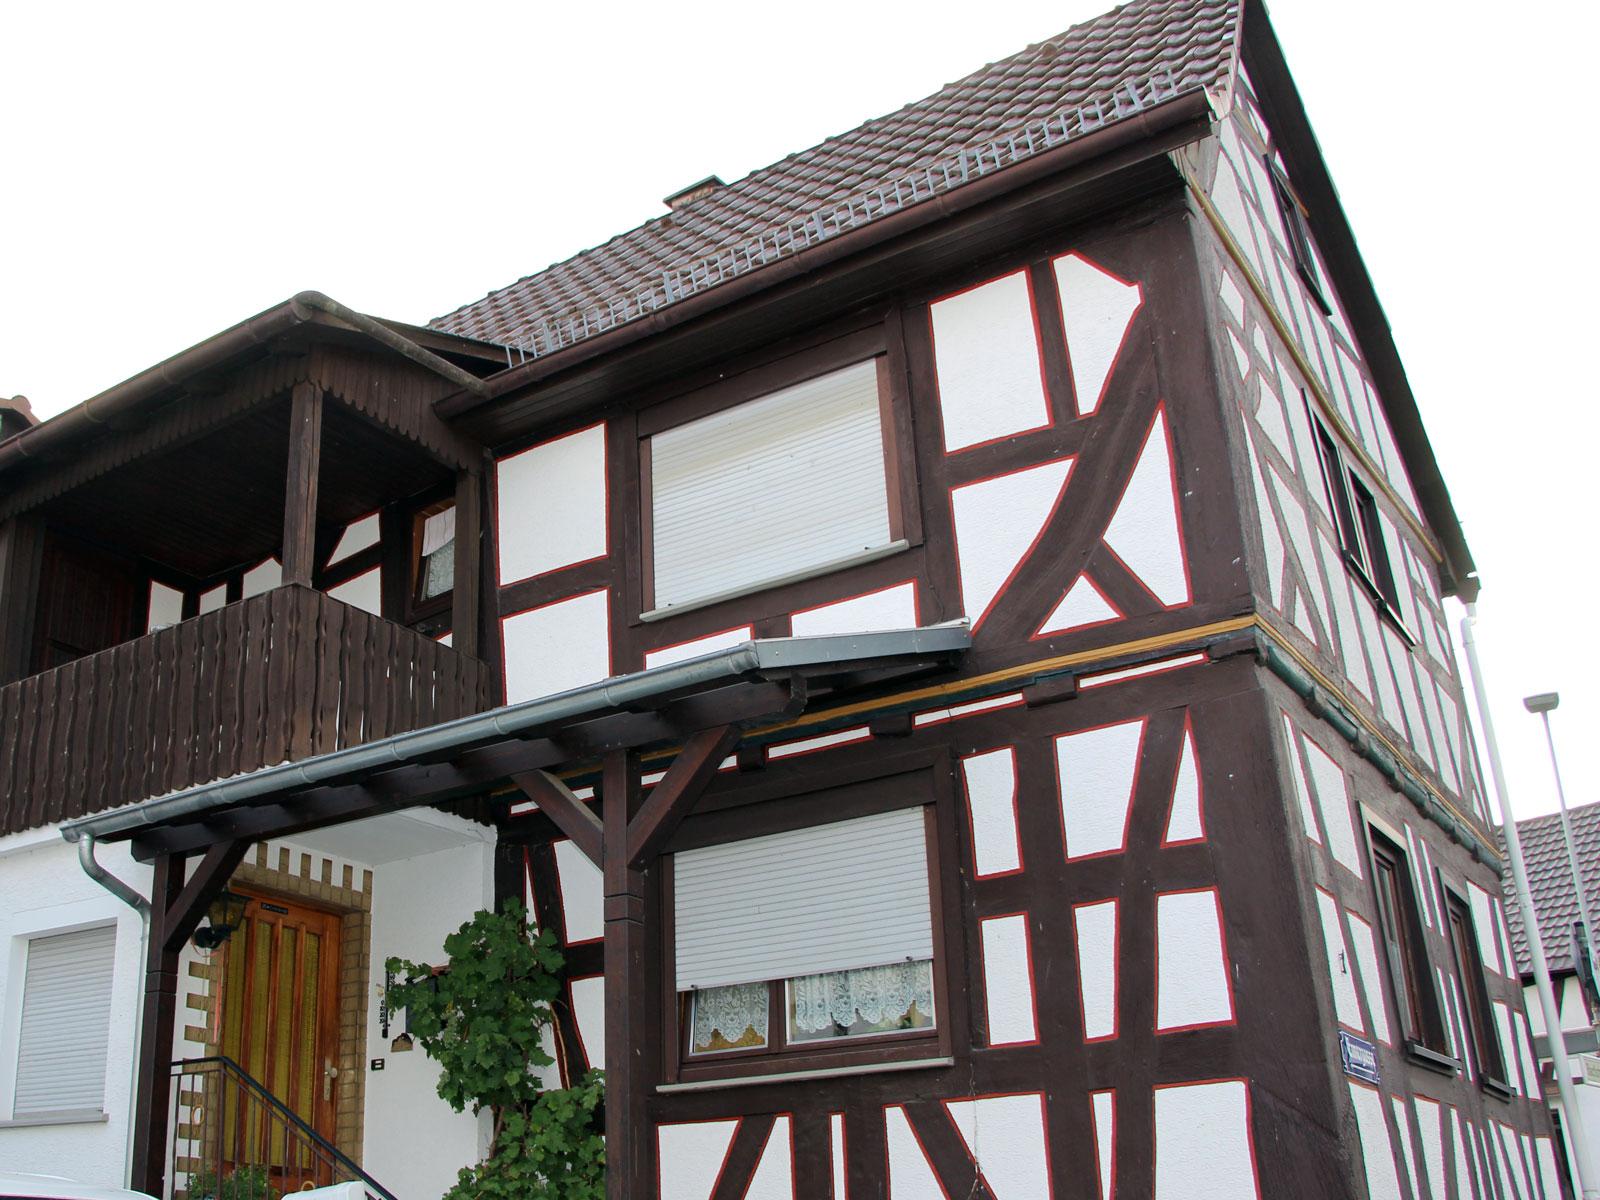 Fachwerkhaus, Bachstrasse 1, Gonterskirchen Laubach